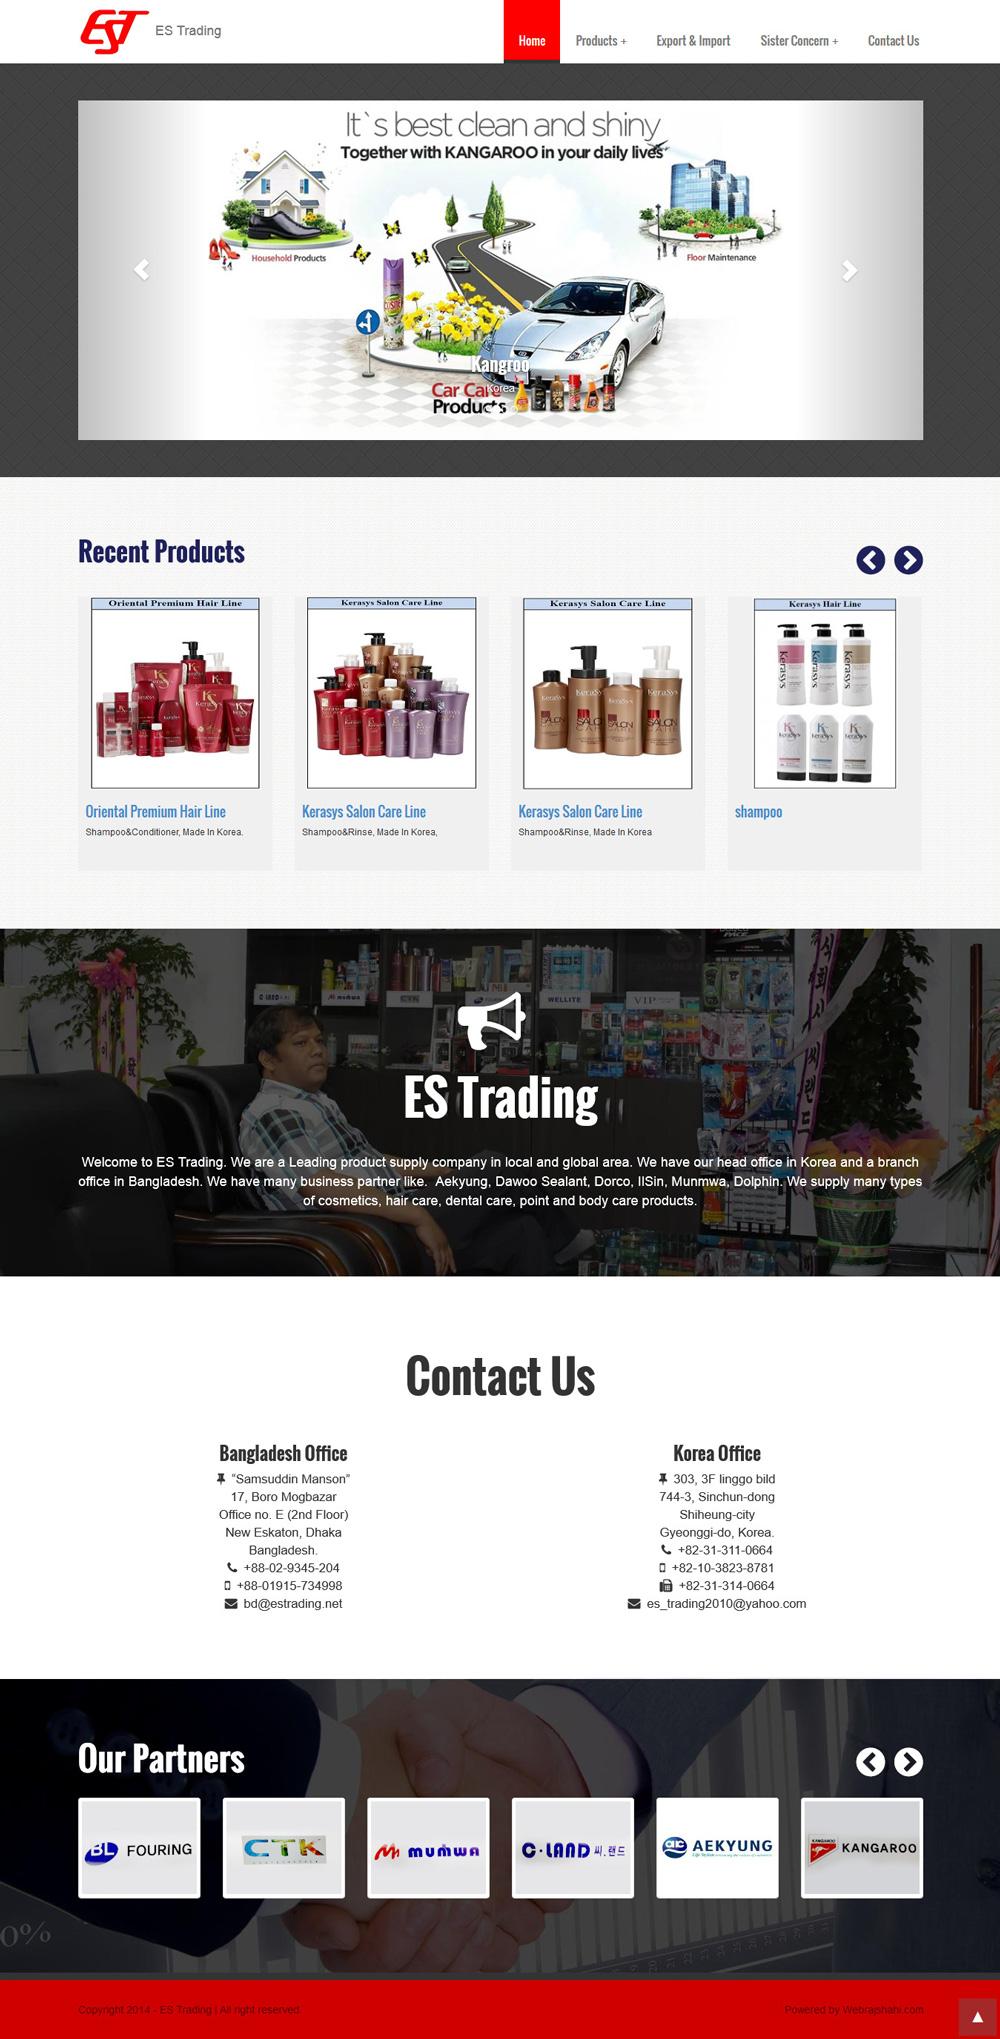 Portfolio of Zahurul - a freelance Web Designer & Developer